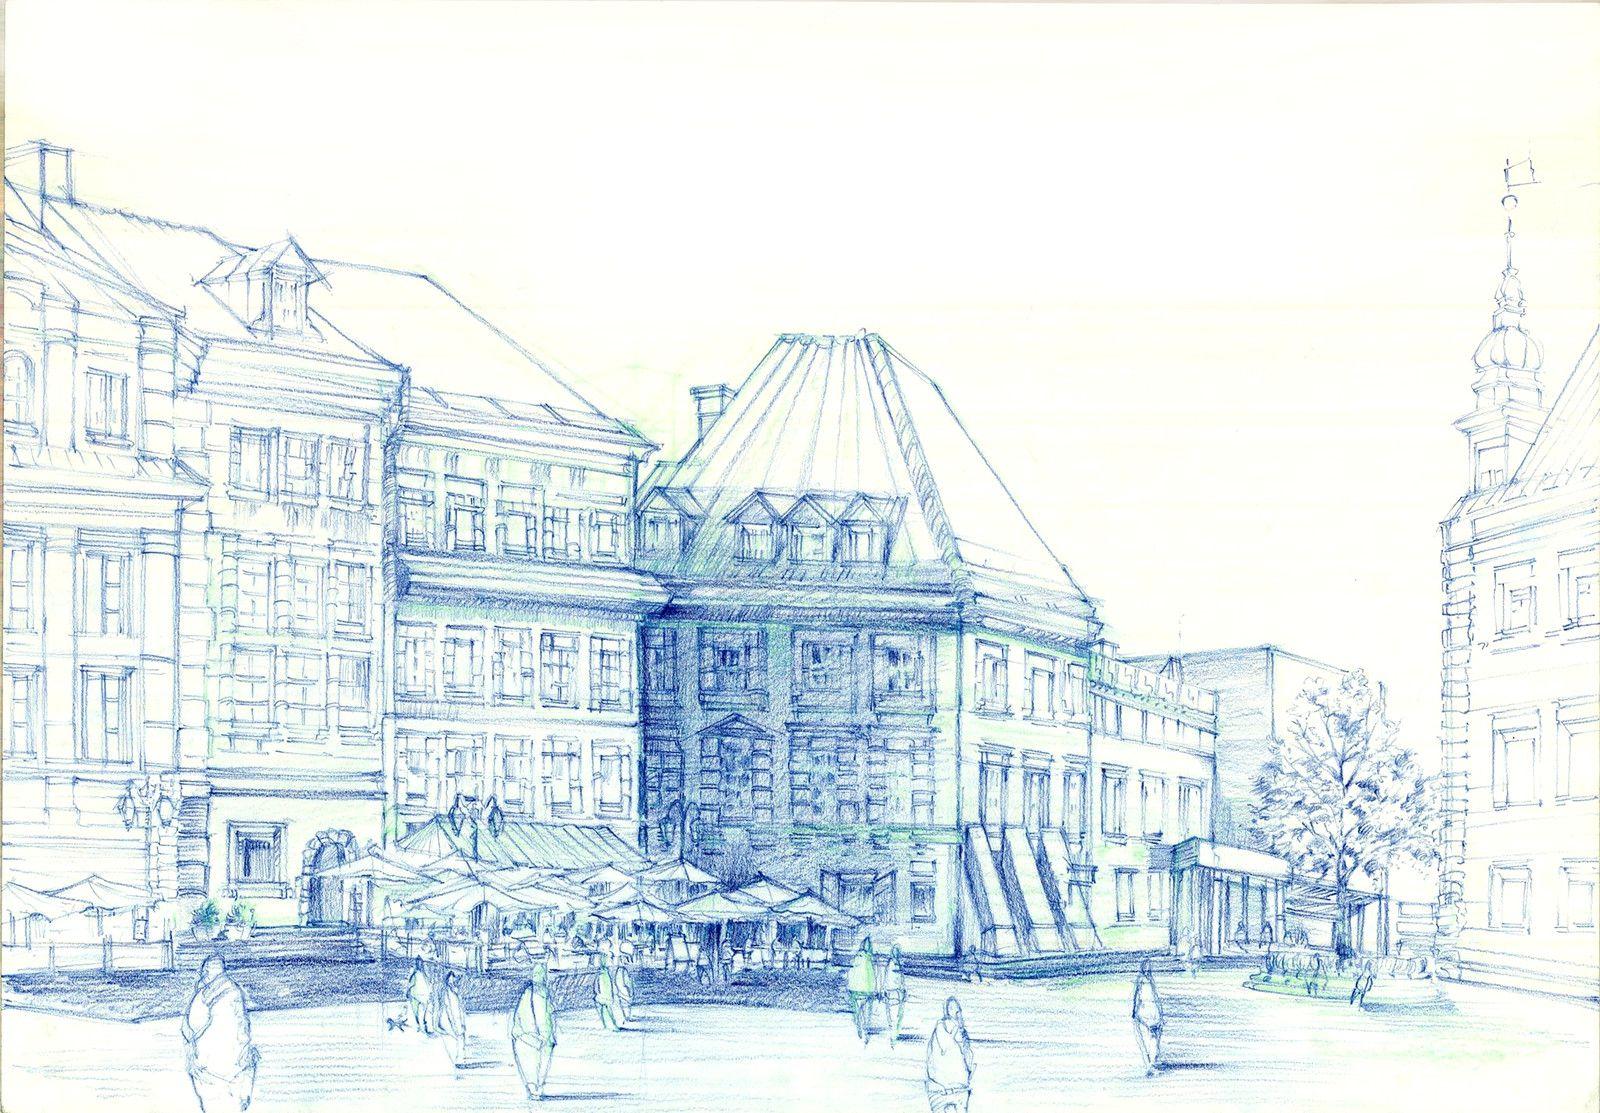 Warsaw - the Old Town, Wiktoria Łabudzińska on ArtStation at https://www.artstation.com/artwork/3mDYD